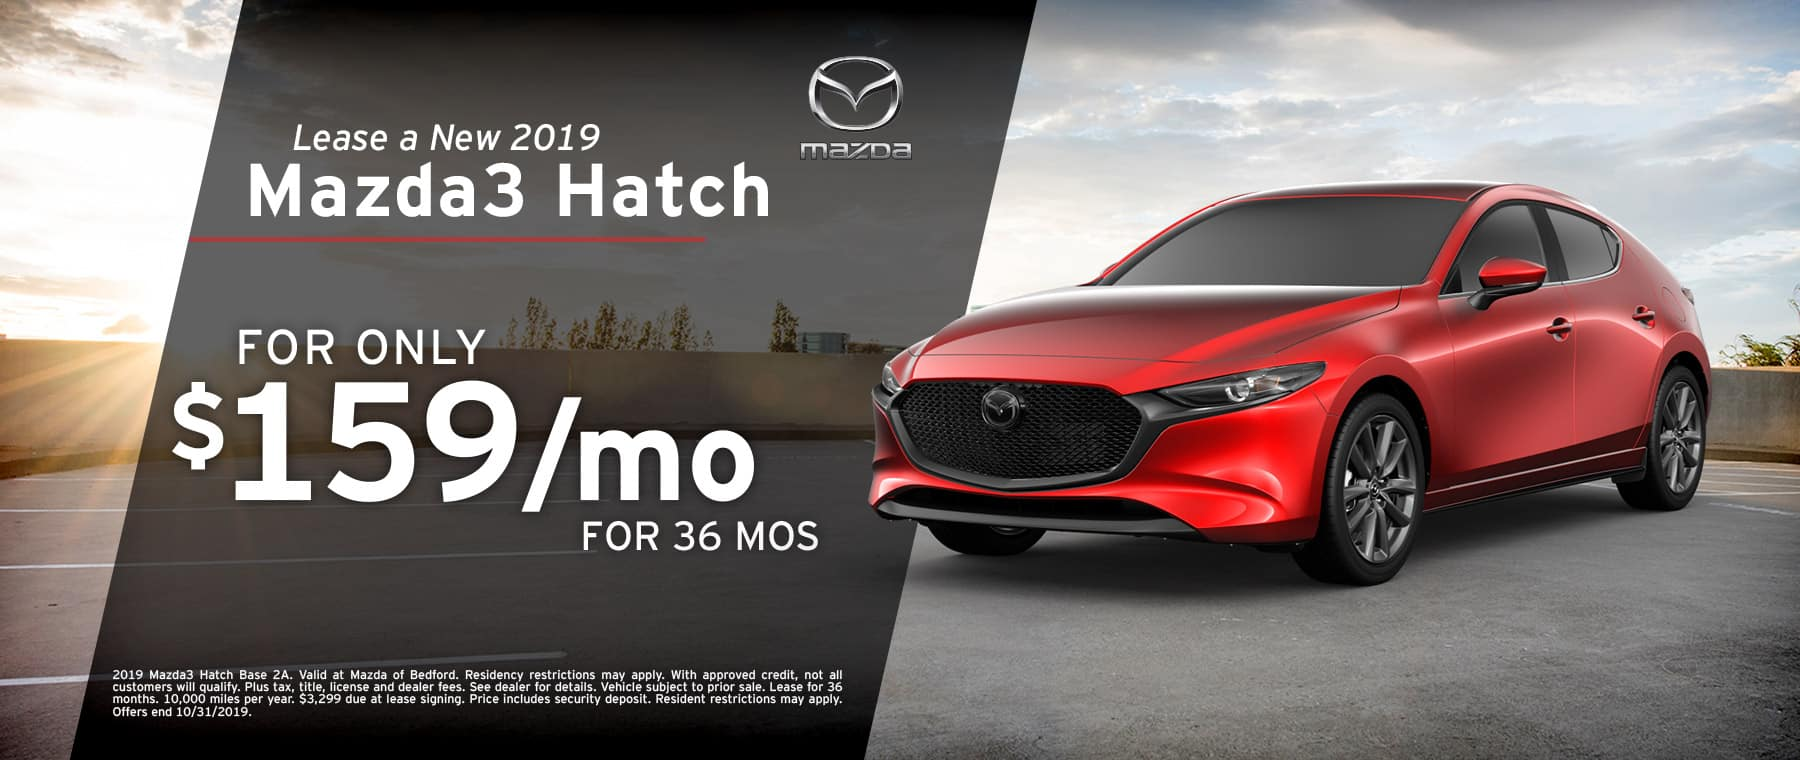 2019 Mazda3 Hatchback at Mazda of Bedford